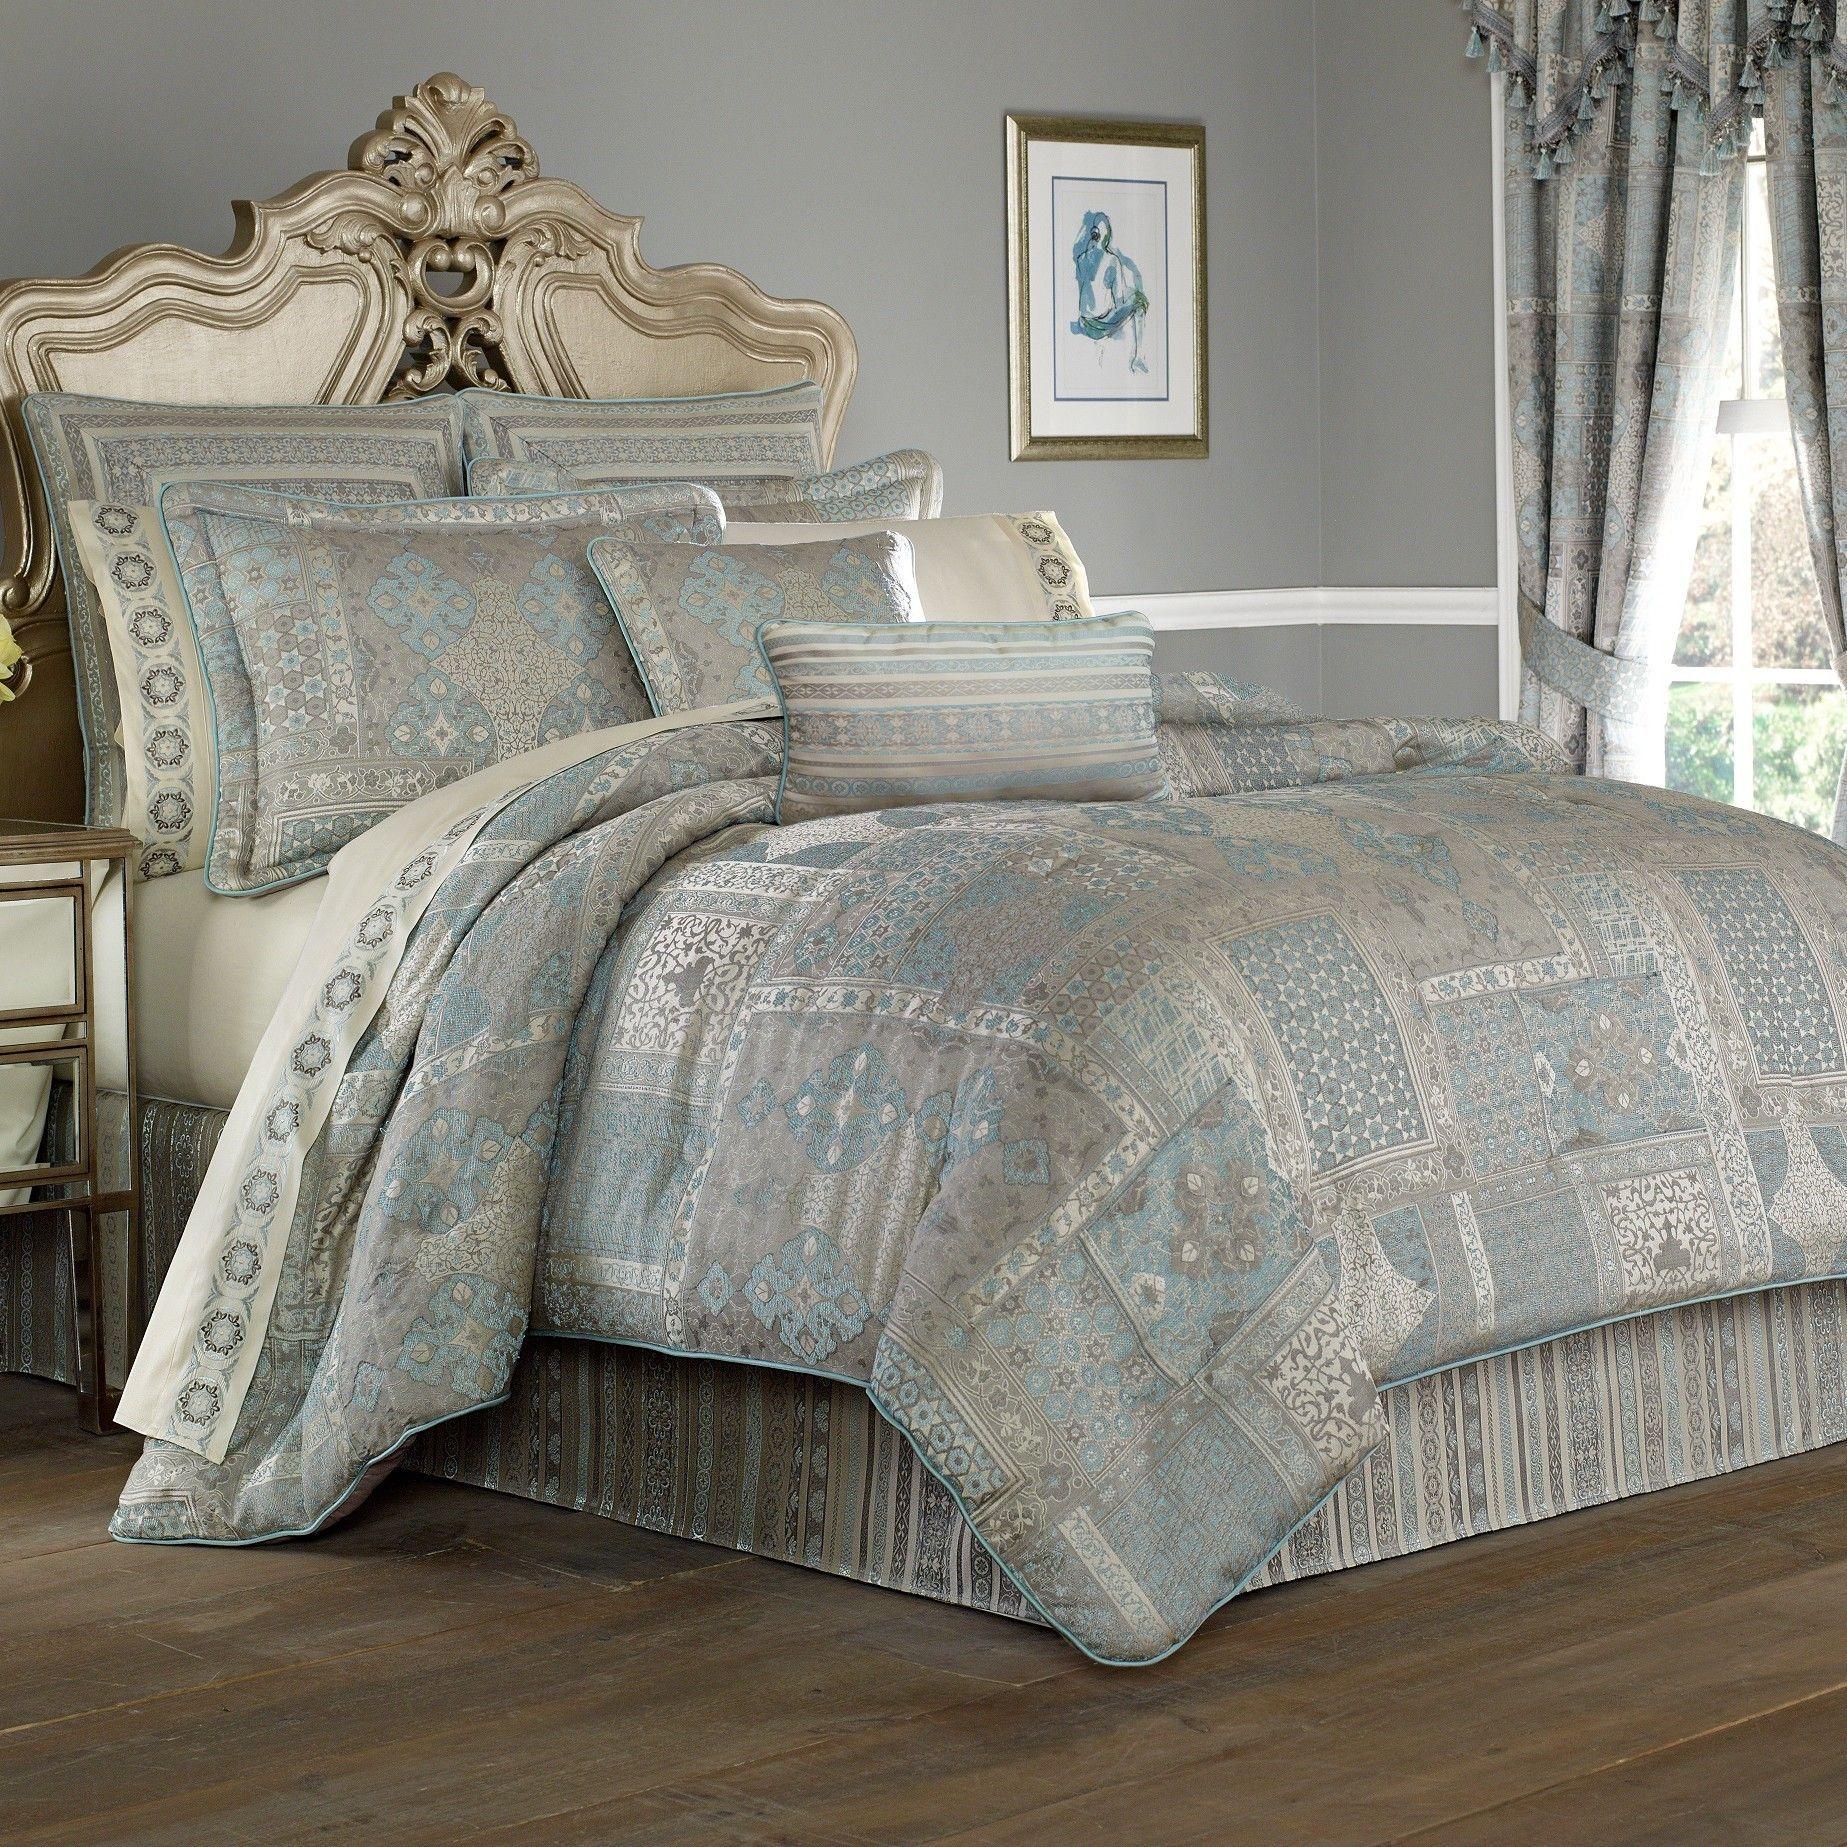 Abigail 4 Piece Comforter Set